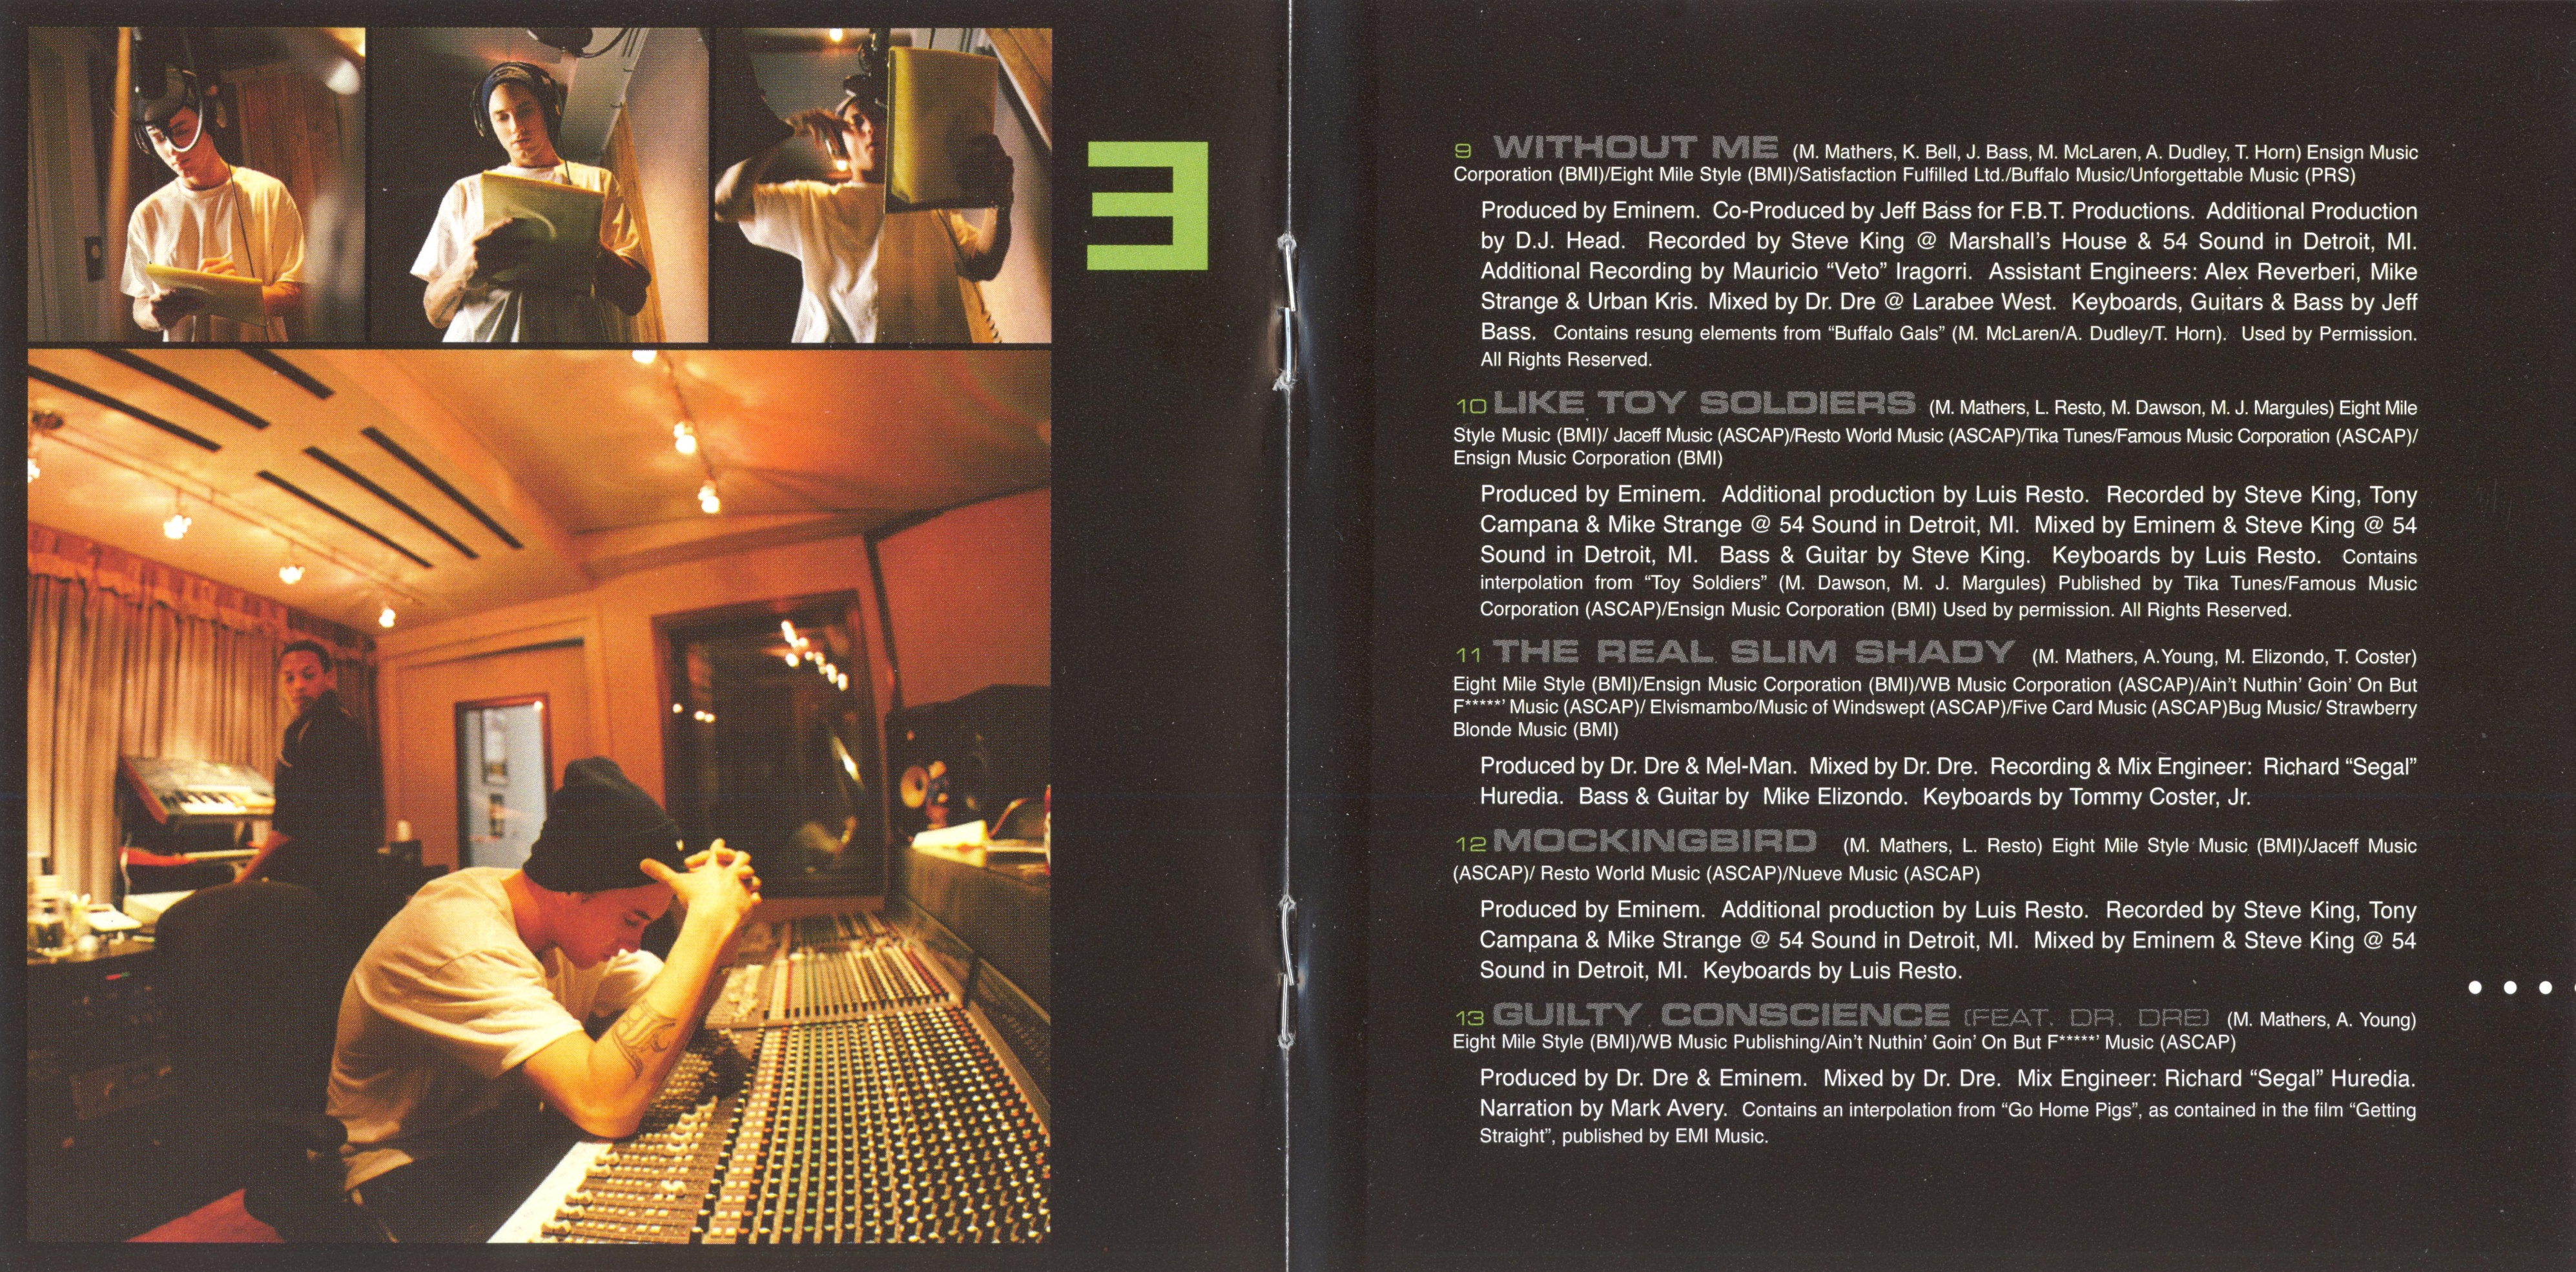 Eminem   Curtain Call The Eminem Curtain Call Vinyl